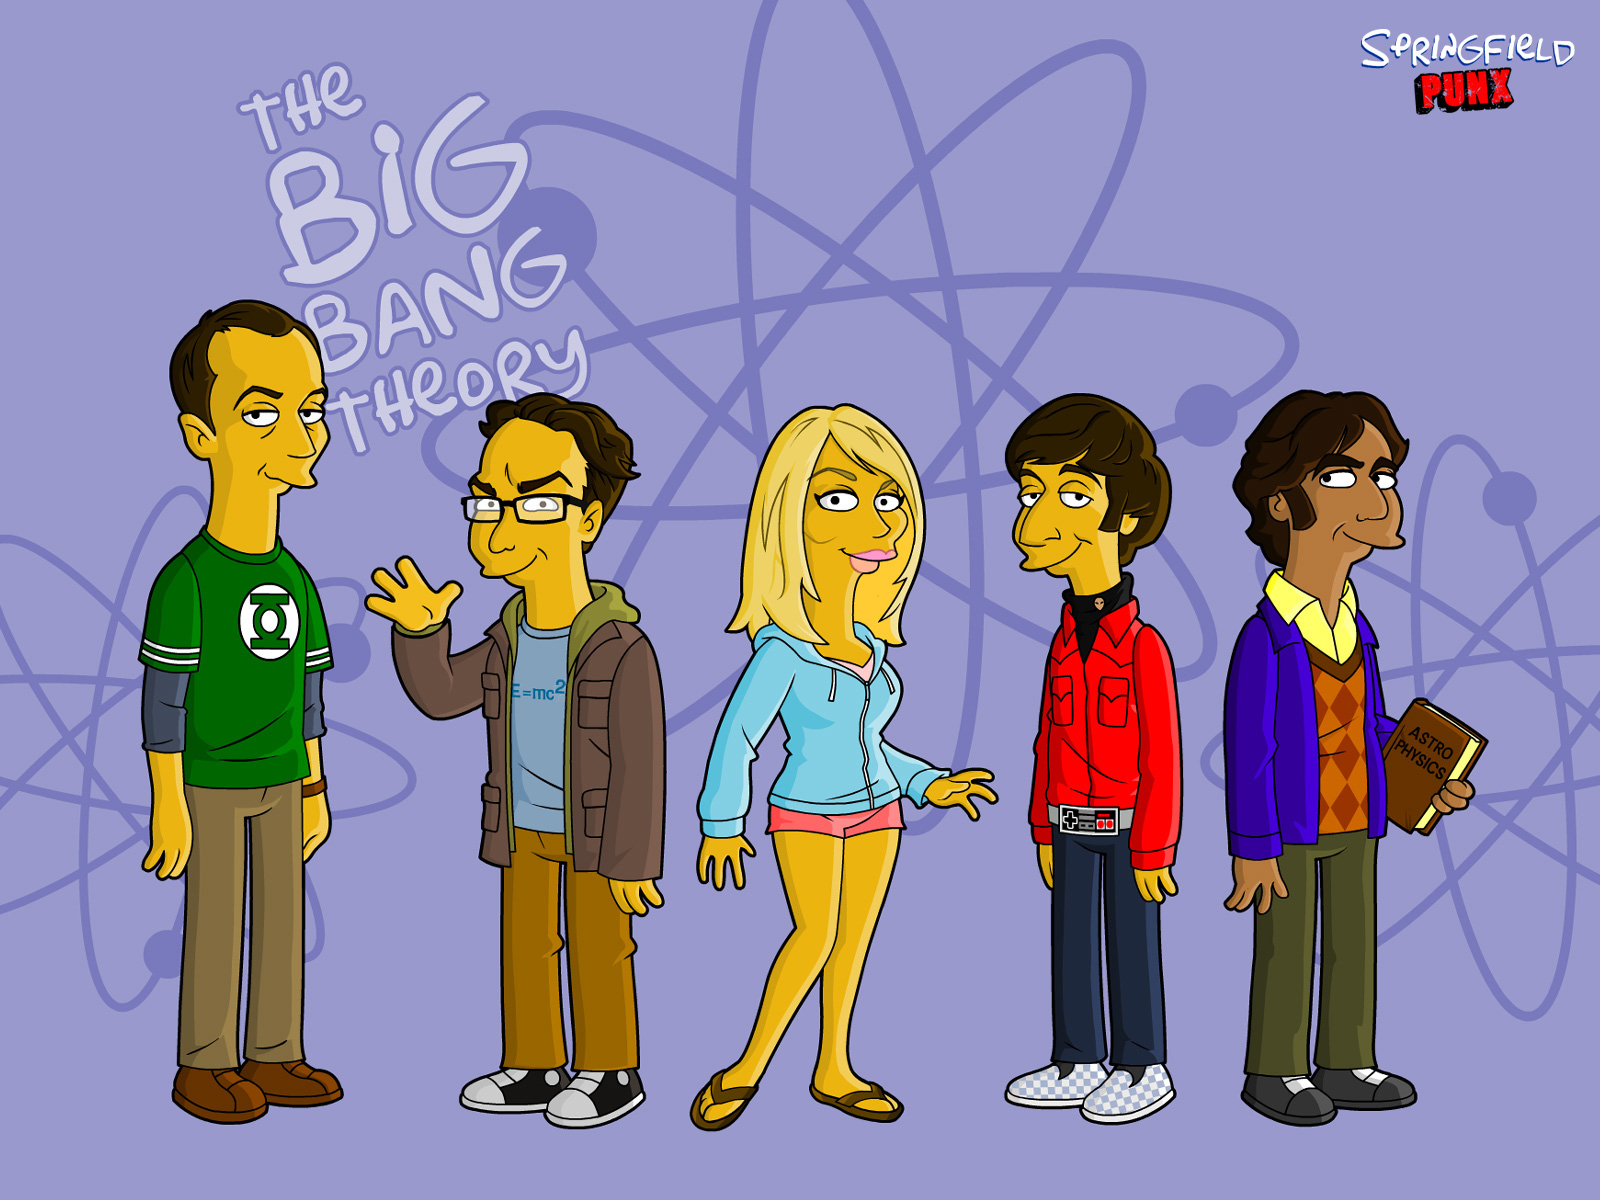 http://1.bp.blogspot.com/-OXQ-0vvPh-M/TrjwYMoHwJI/AAAAAAAAFR8/l0AeD7Tg46c/s1600/The-Big-Bang-Theory-Wallpaper-1600x1200.jpg